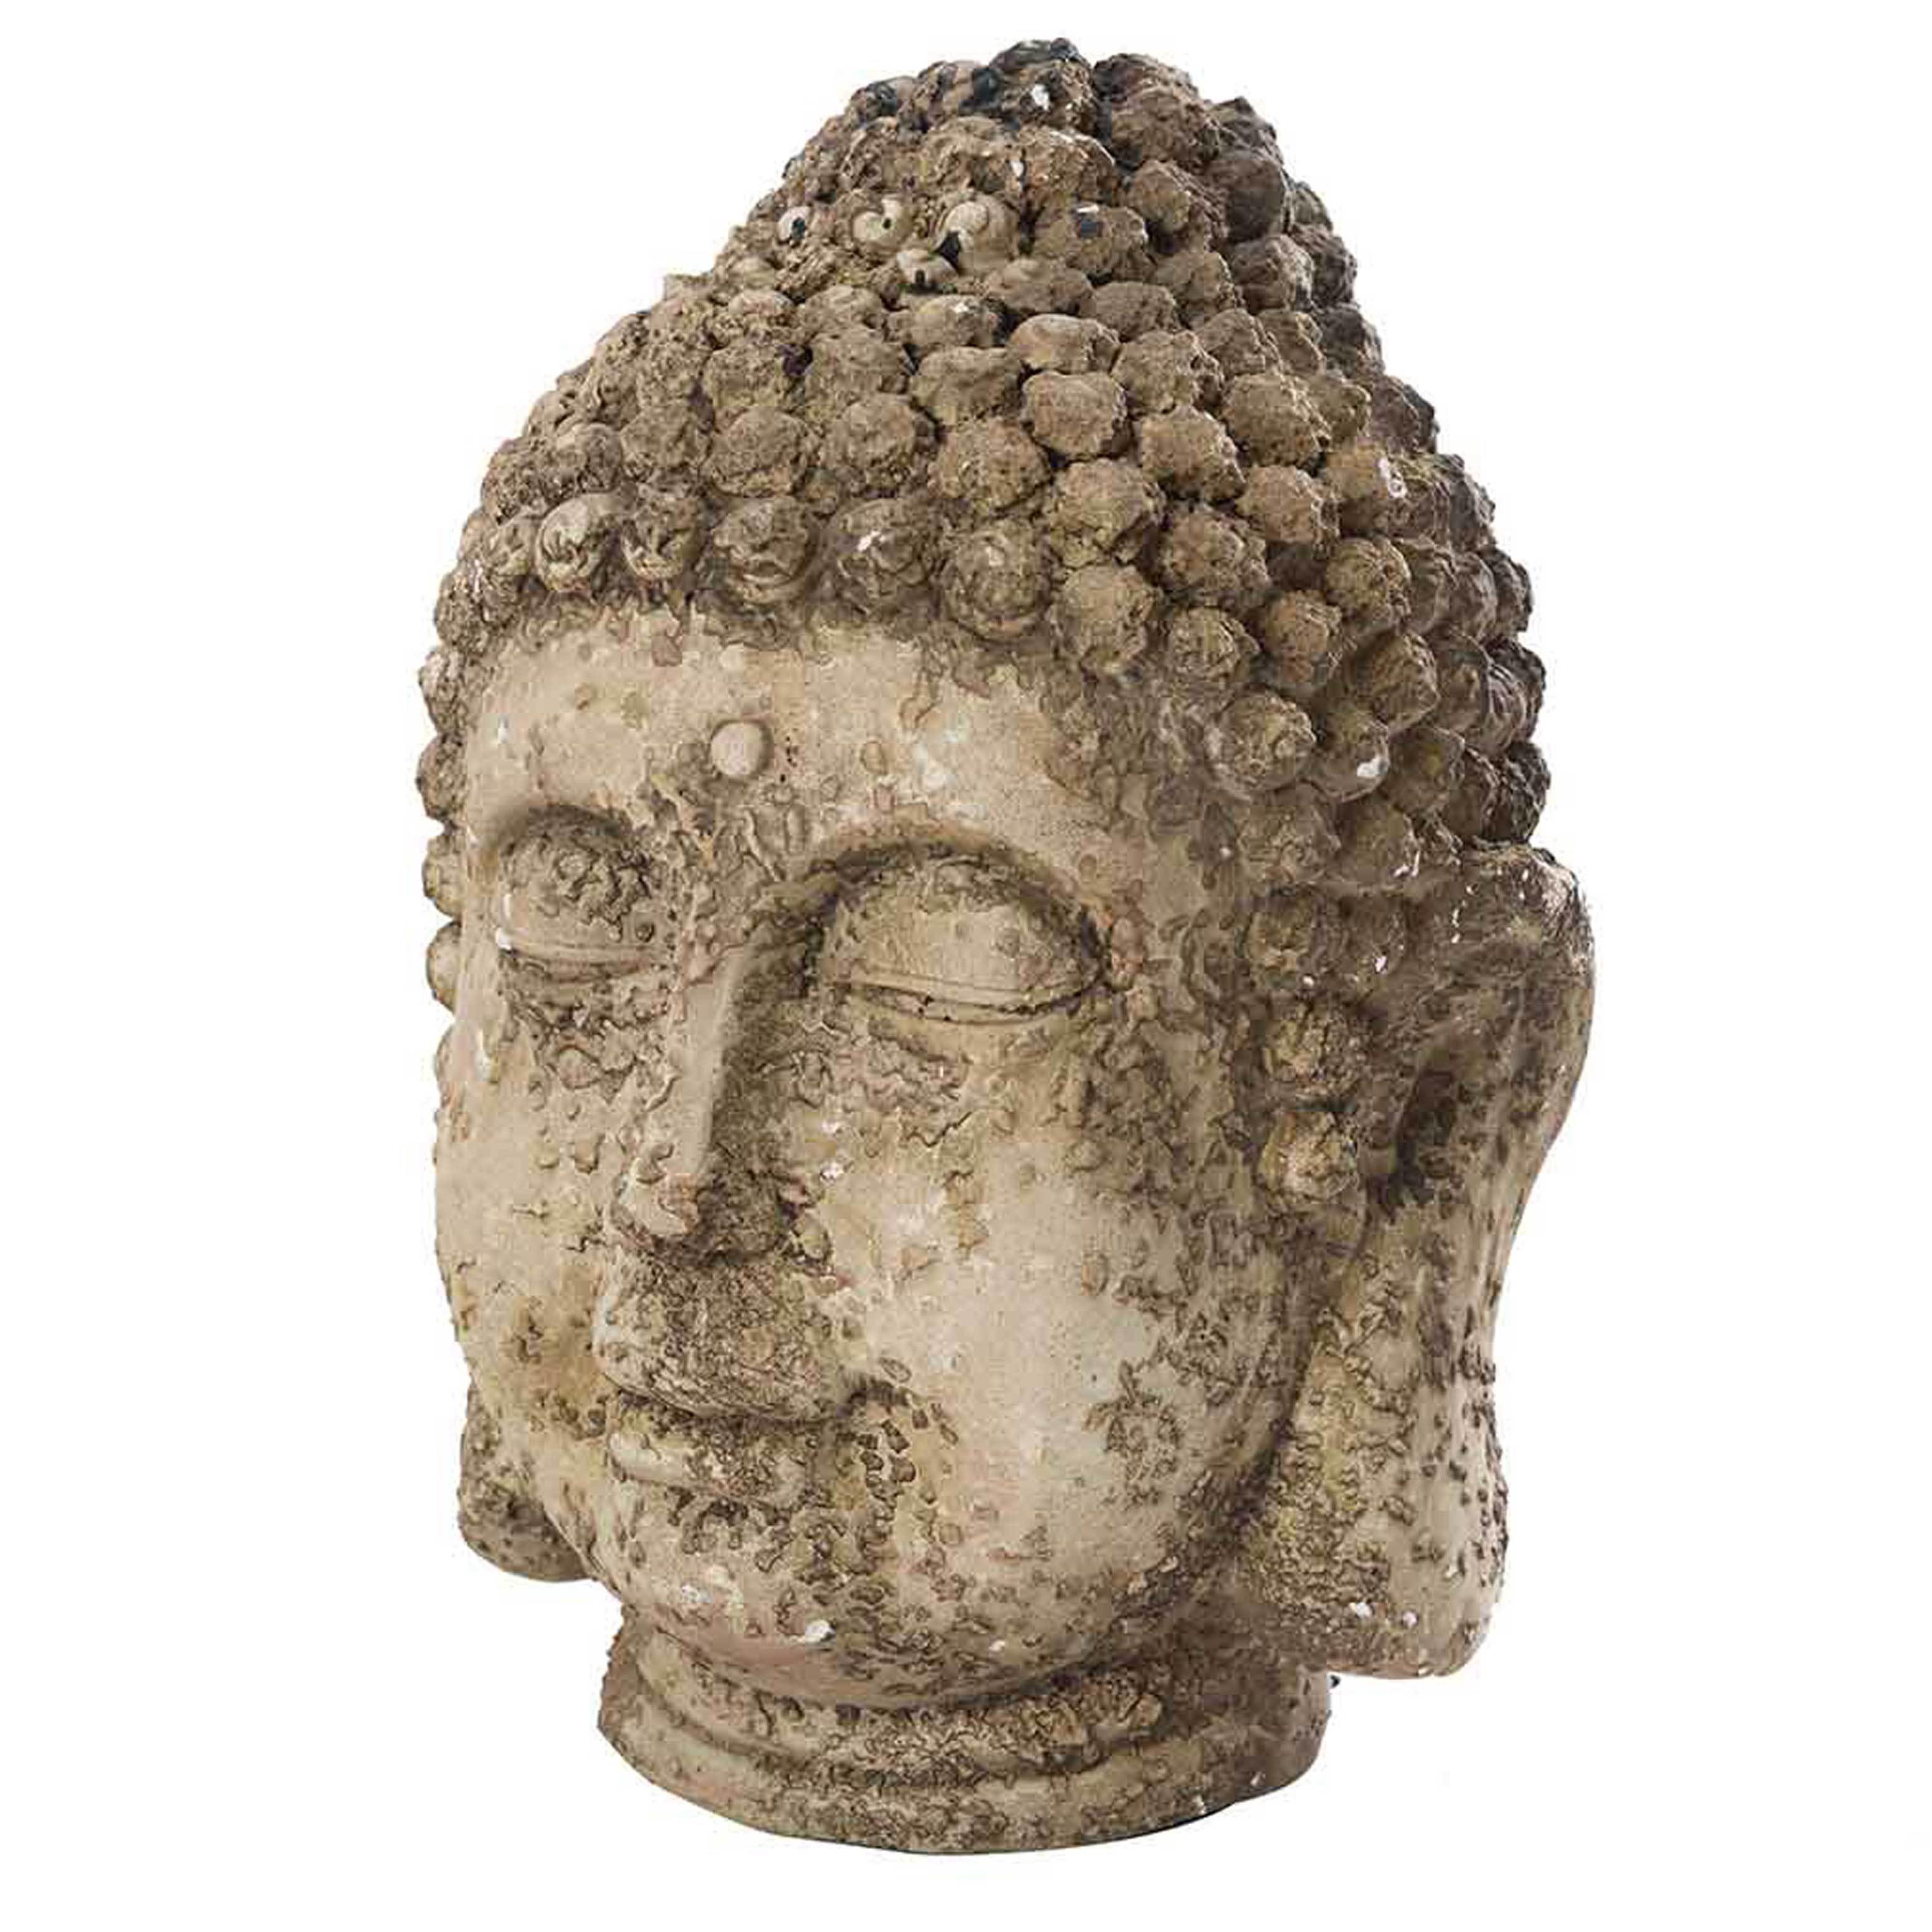 Shop Sunjoy Rustic Garden Buda Statue, 17-inch, Resin - Free ...